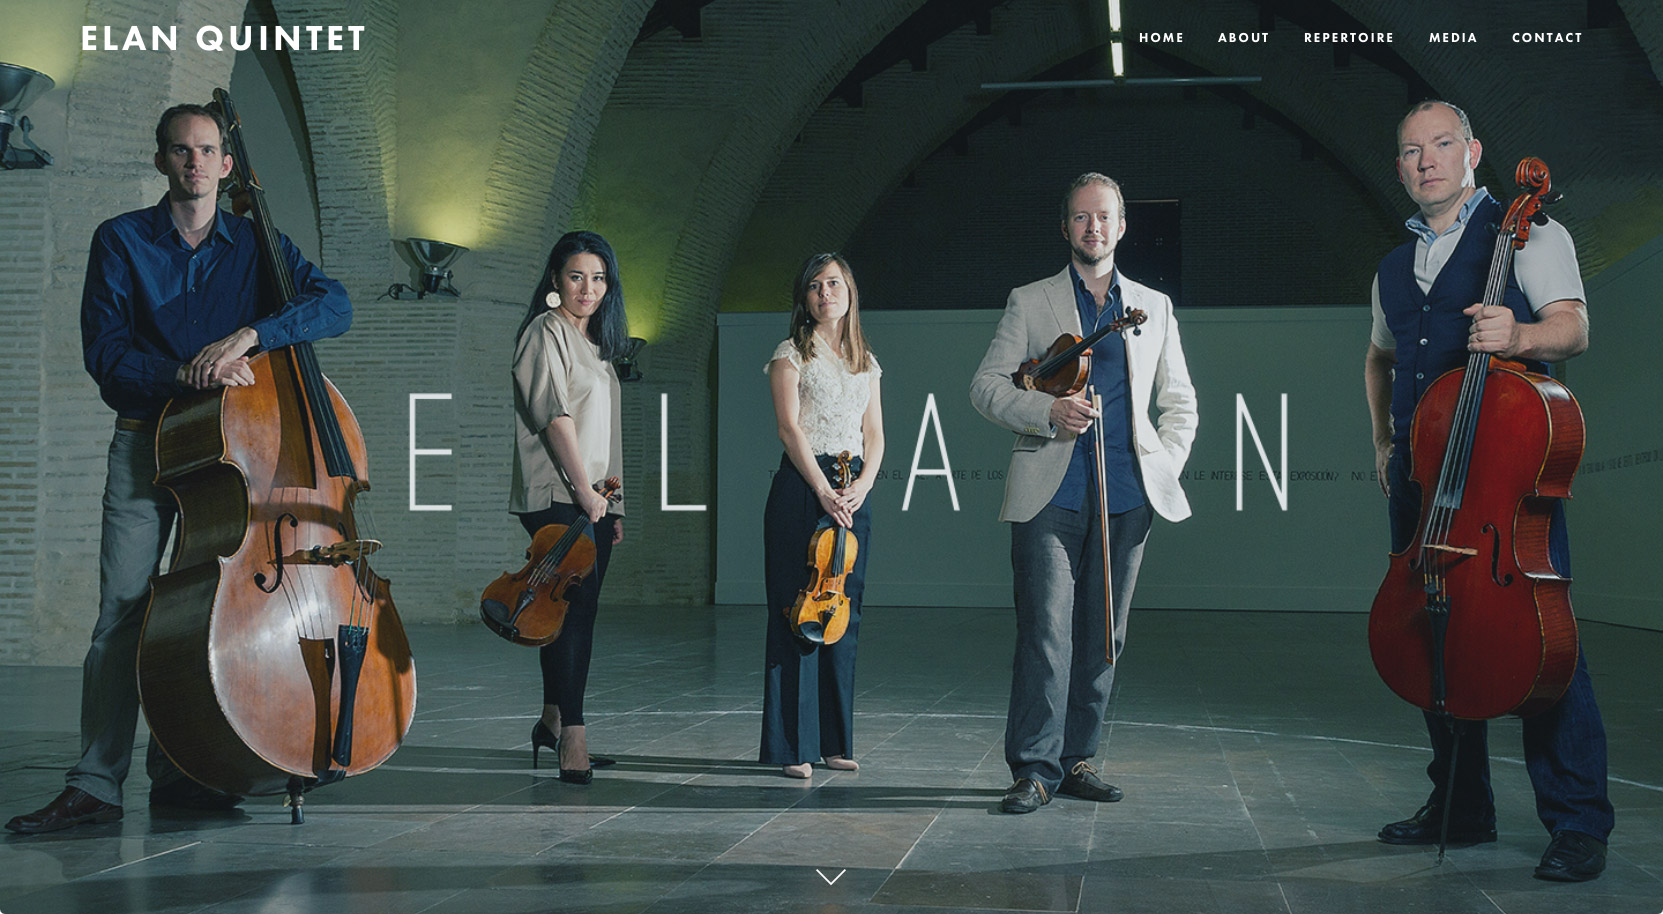 Elan Quintet Website